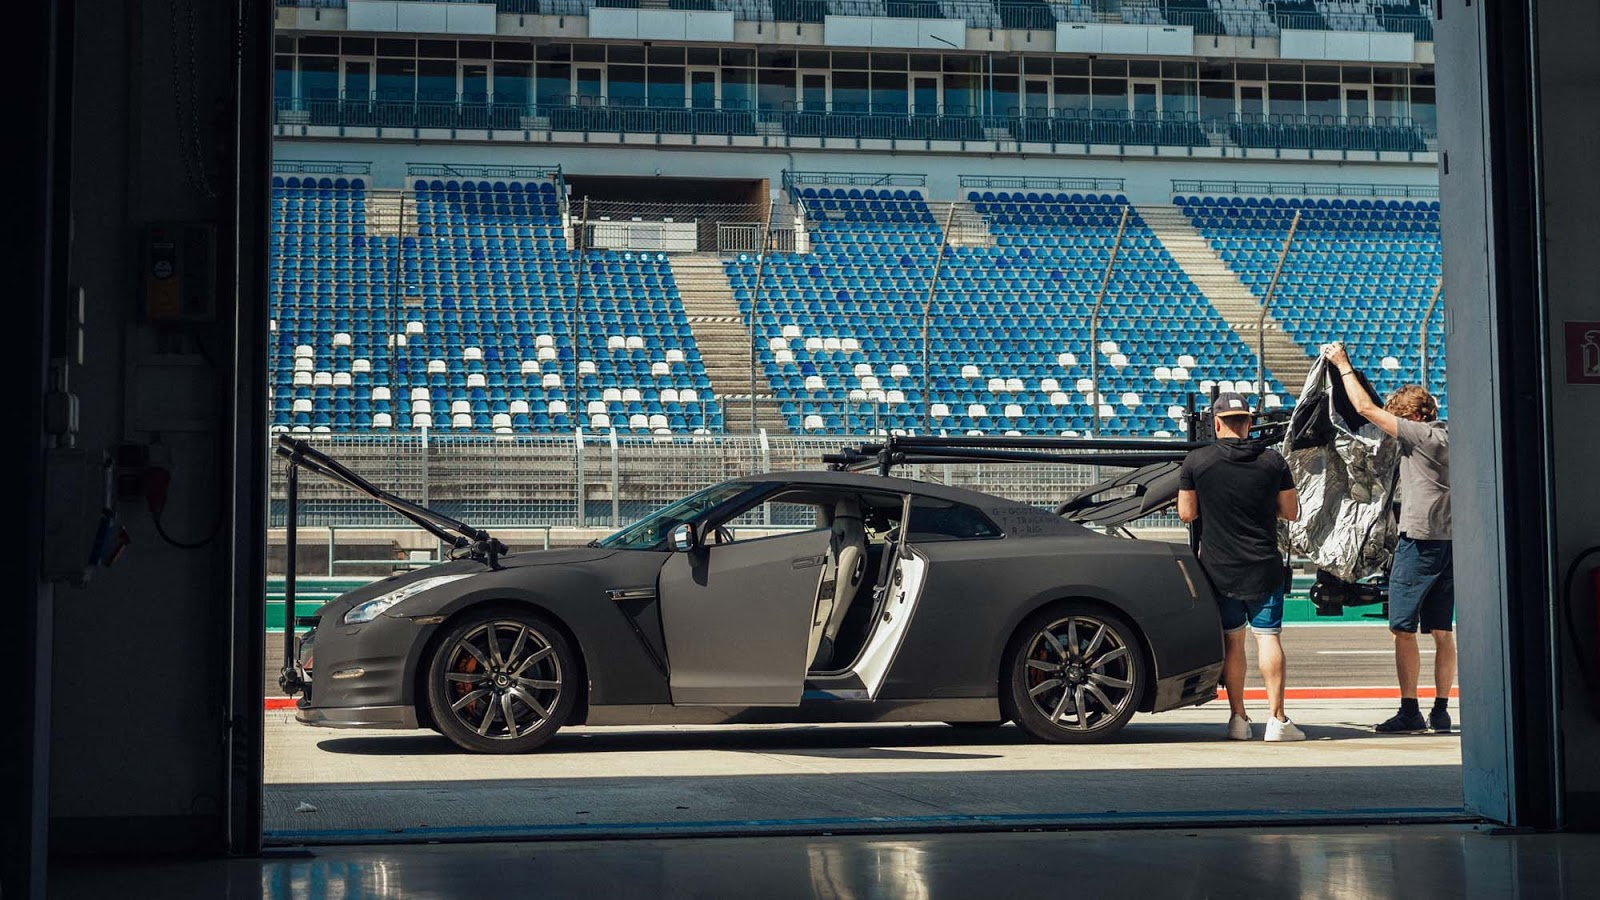 GT R NISMO Berlin Test Drive 2 Πώς μπορείς να κινηματογραφήσεις τον Godzilla Godzilla, GTR, Nismo, Nismo GT-R, Nissan, Nissan GT-R NISMO, video, videos, zblog, ΦΩΤΟ, φωτογραφίες